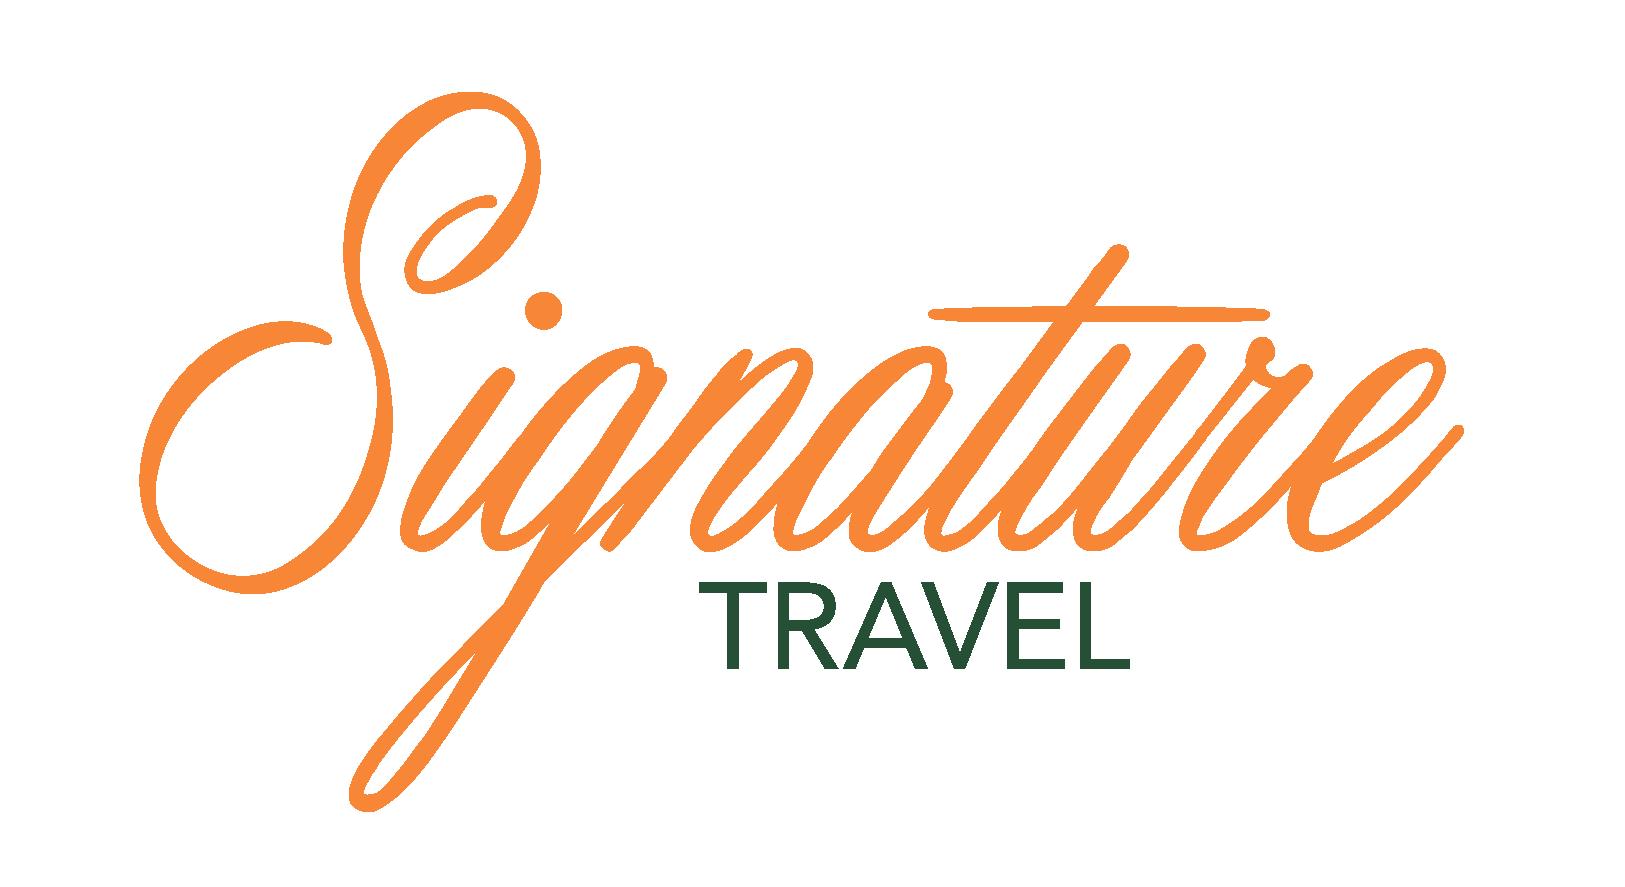 Signature Travel_LOGO REV 01-02.png